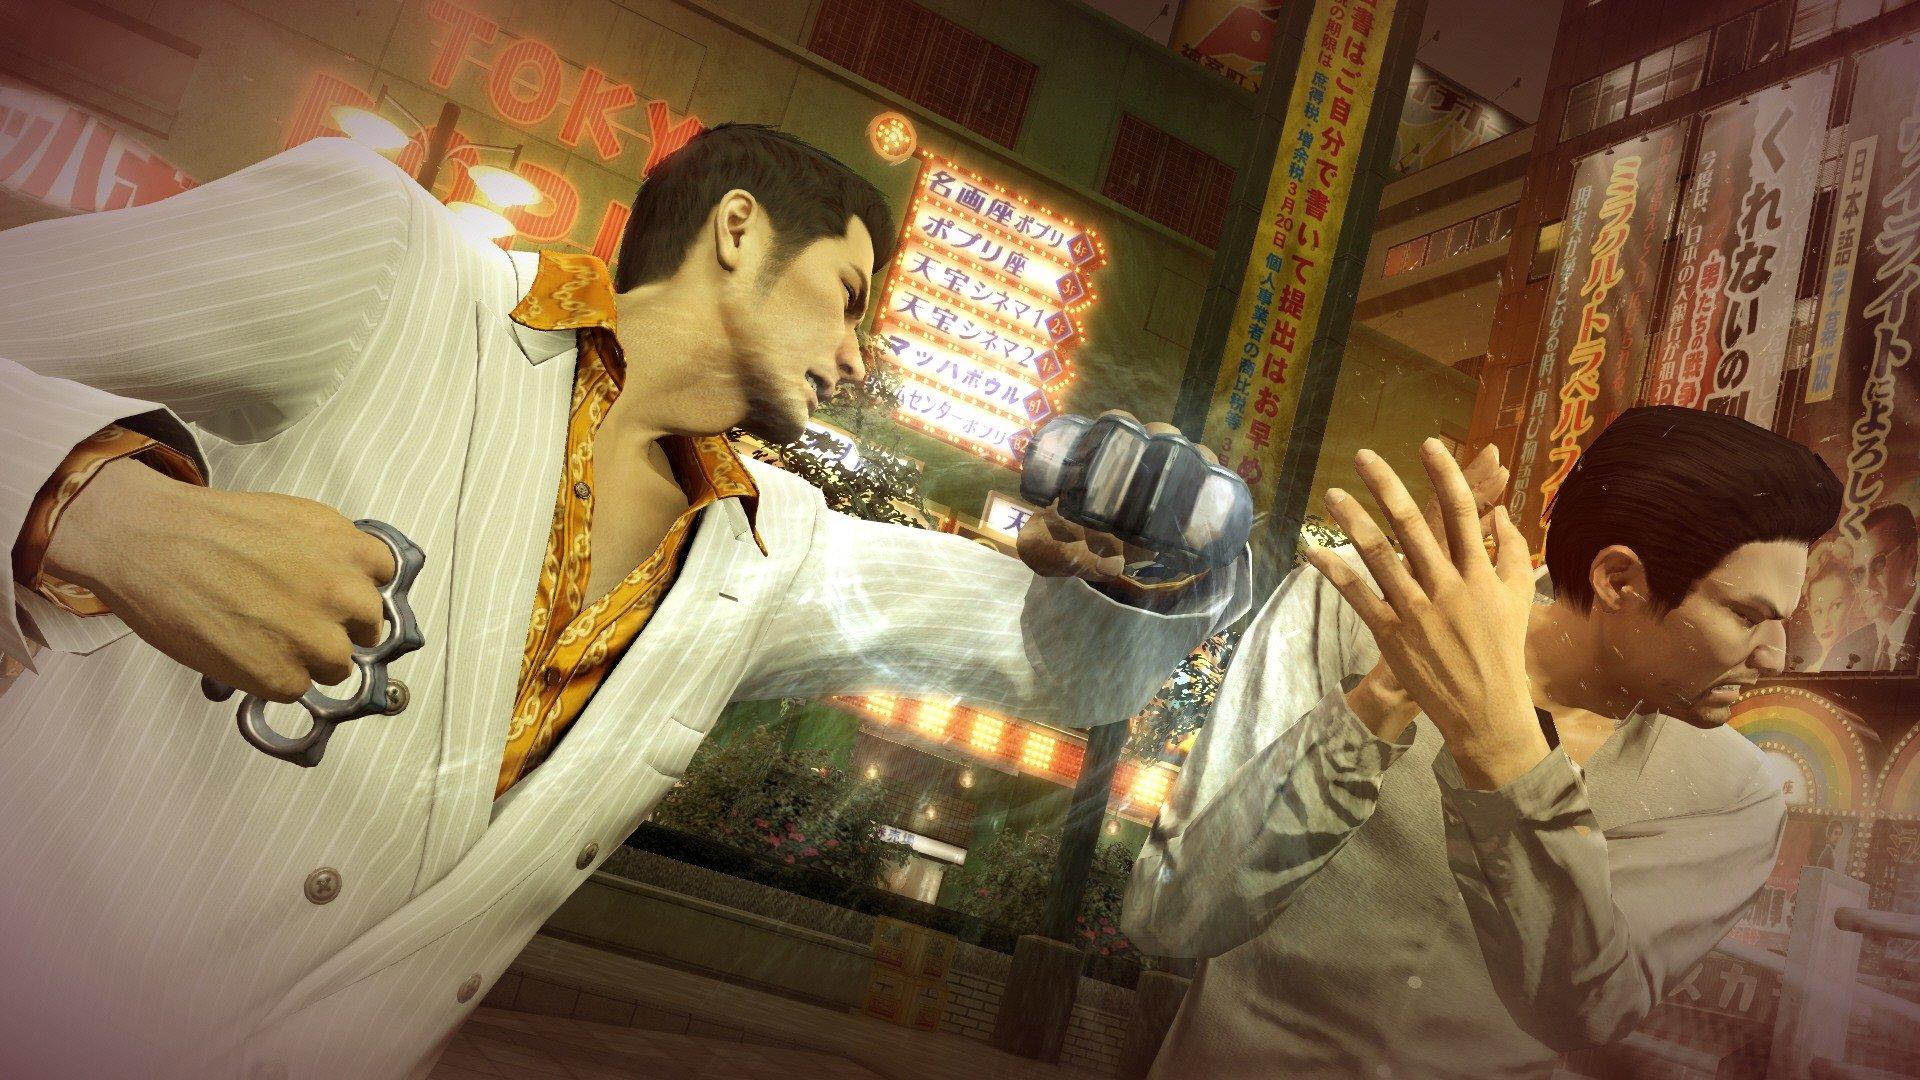 Download Yakuza 0 HD Wallpapers | Read games reviews, play online games & download games wallpapers